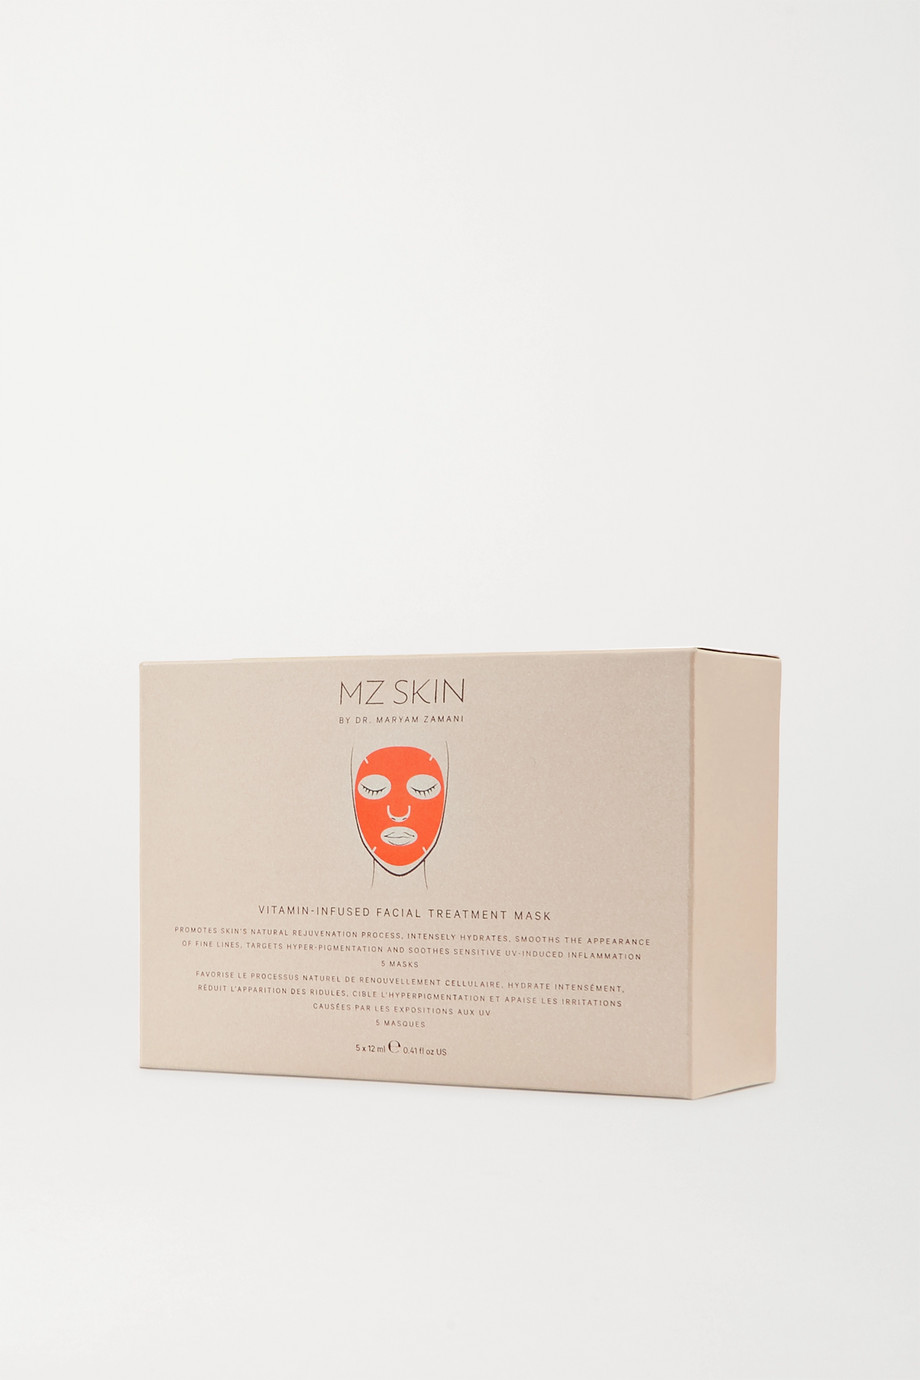 MZ Skin Vitamin-Infused Facial Treatment Mask x 5